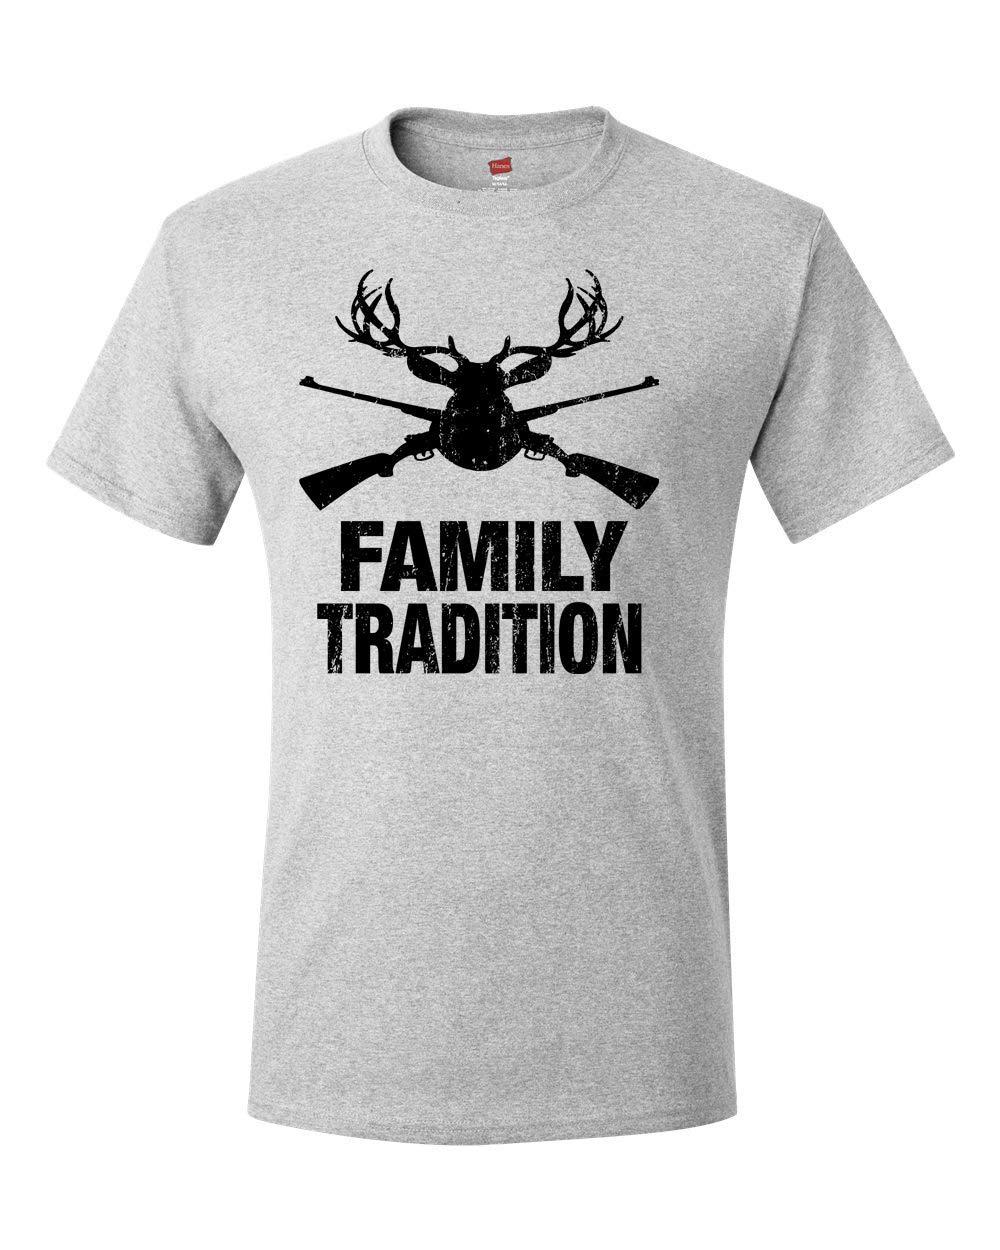 S Tshirt Hunting Family Tradition T